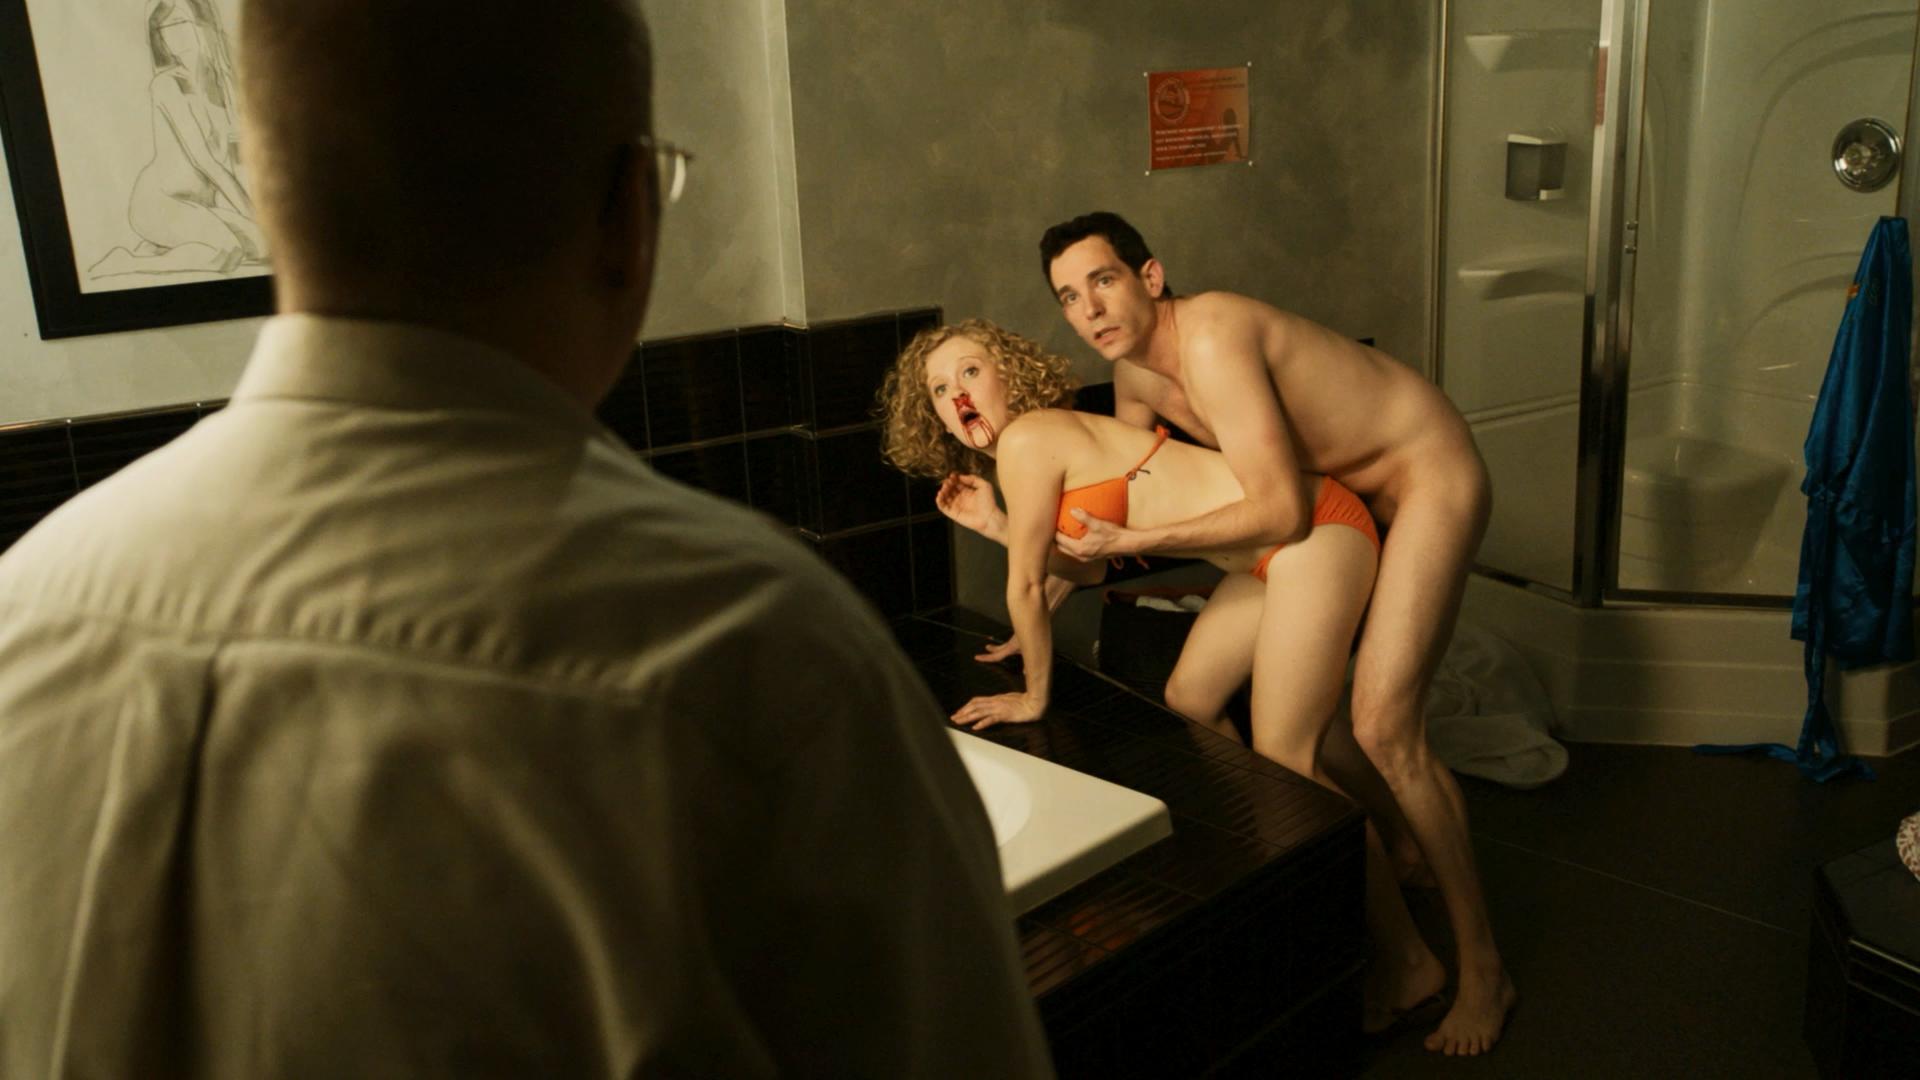 Смотреть фільми про порно 18 фотография